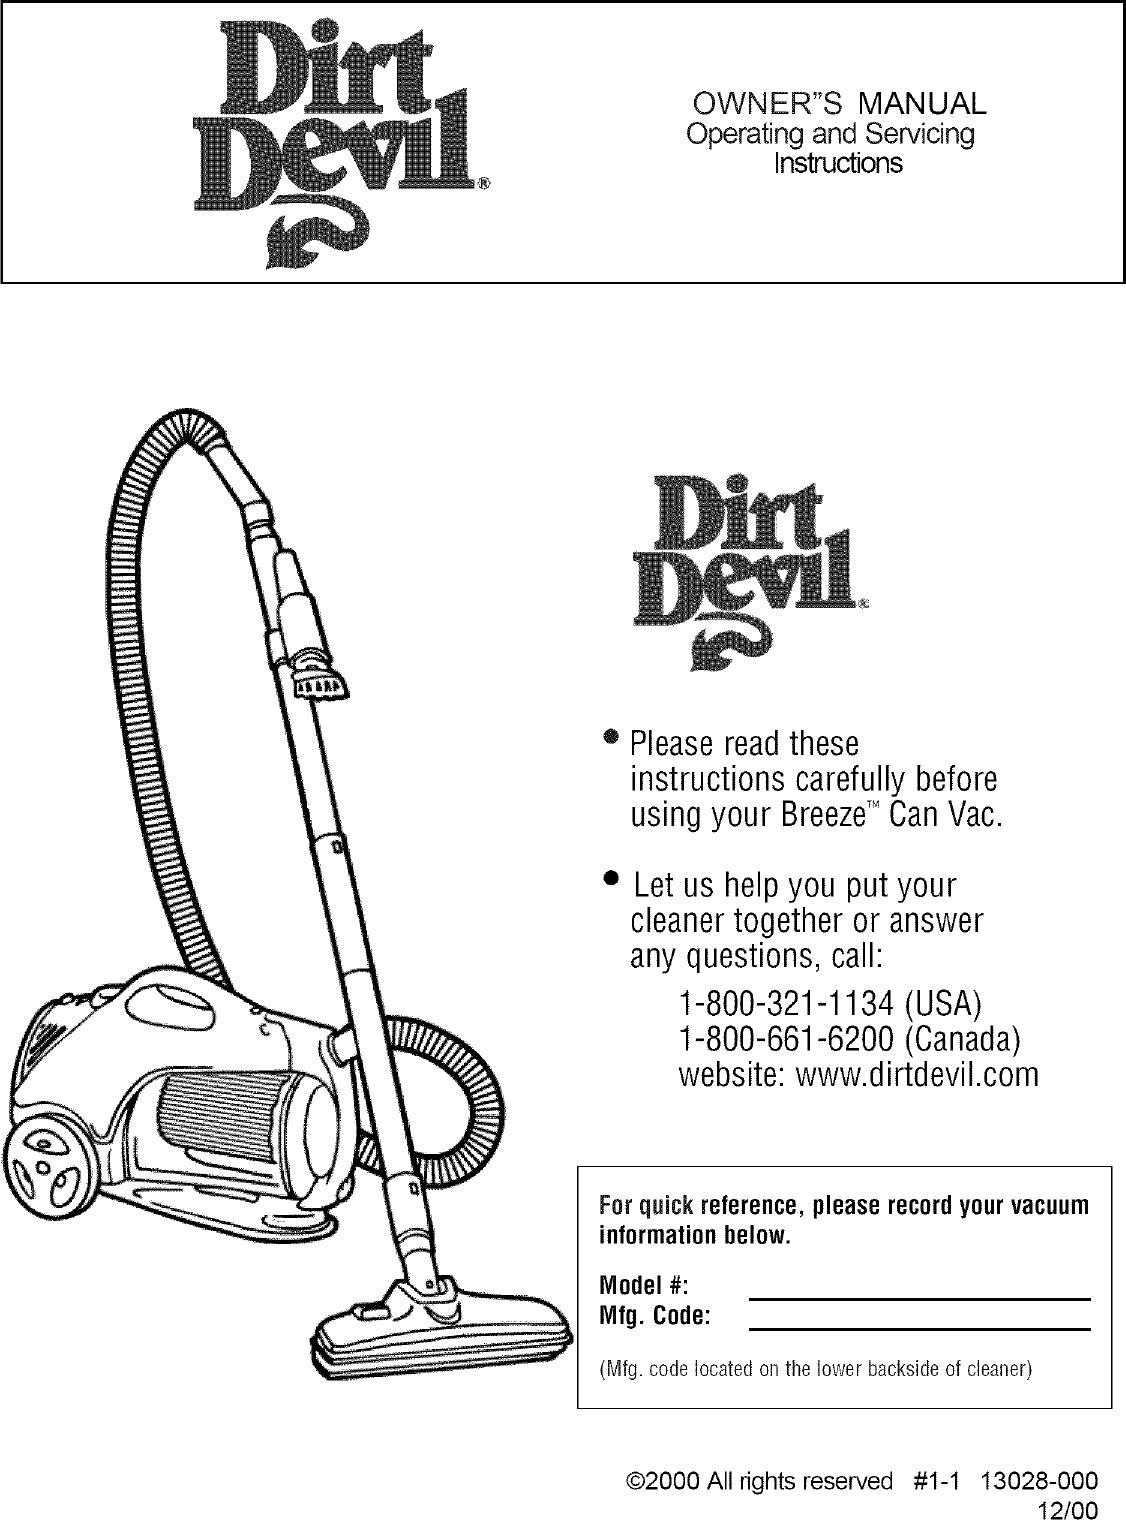 Dirt devil centrino user manual